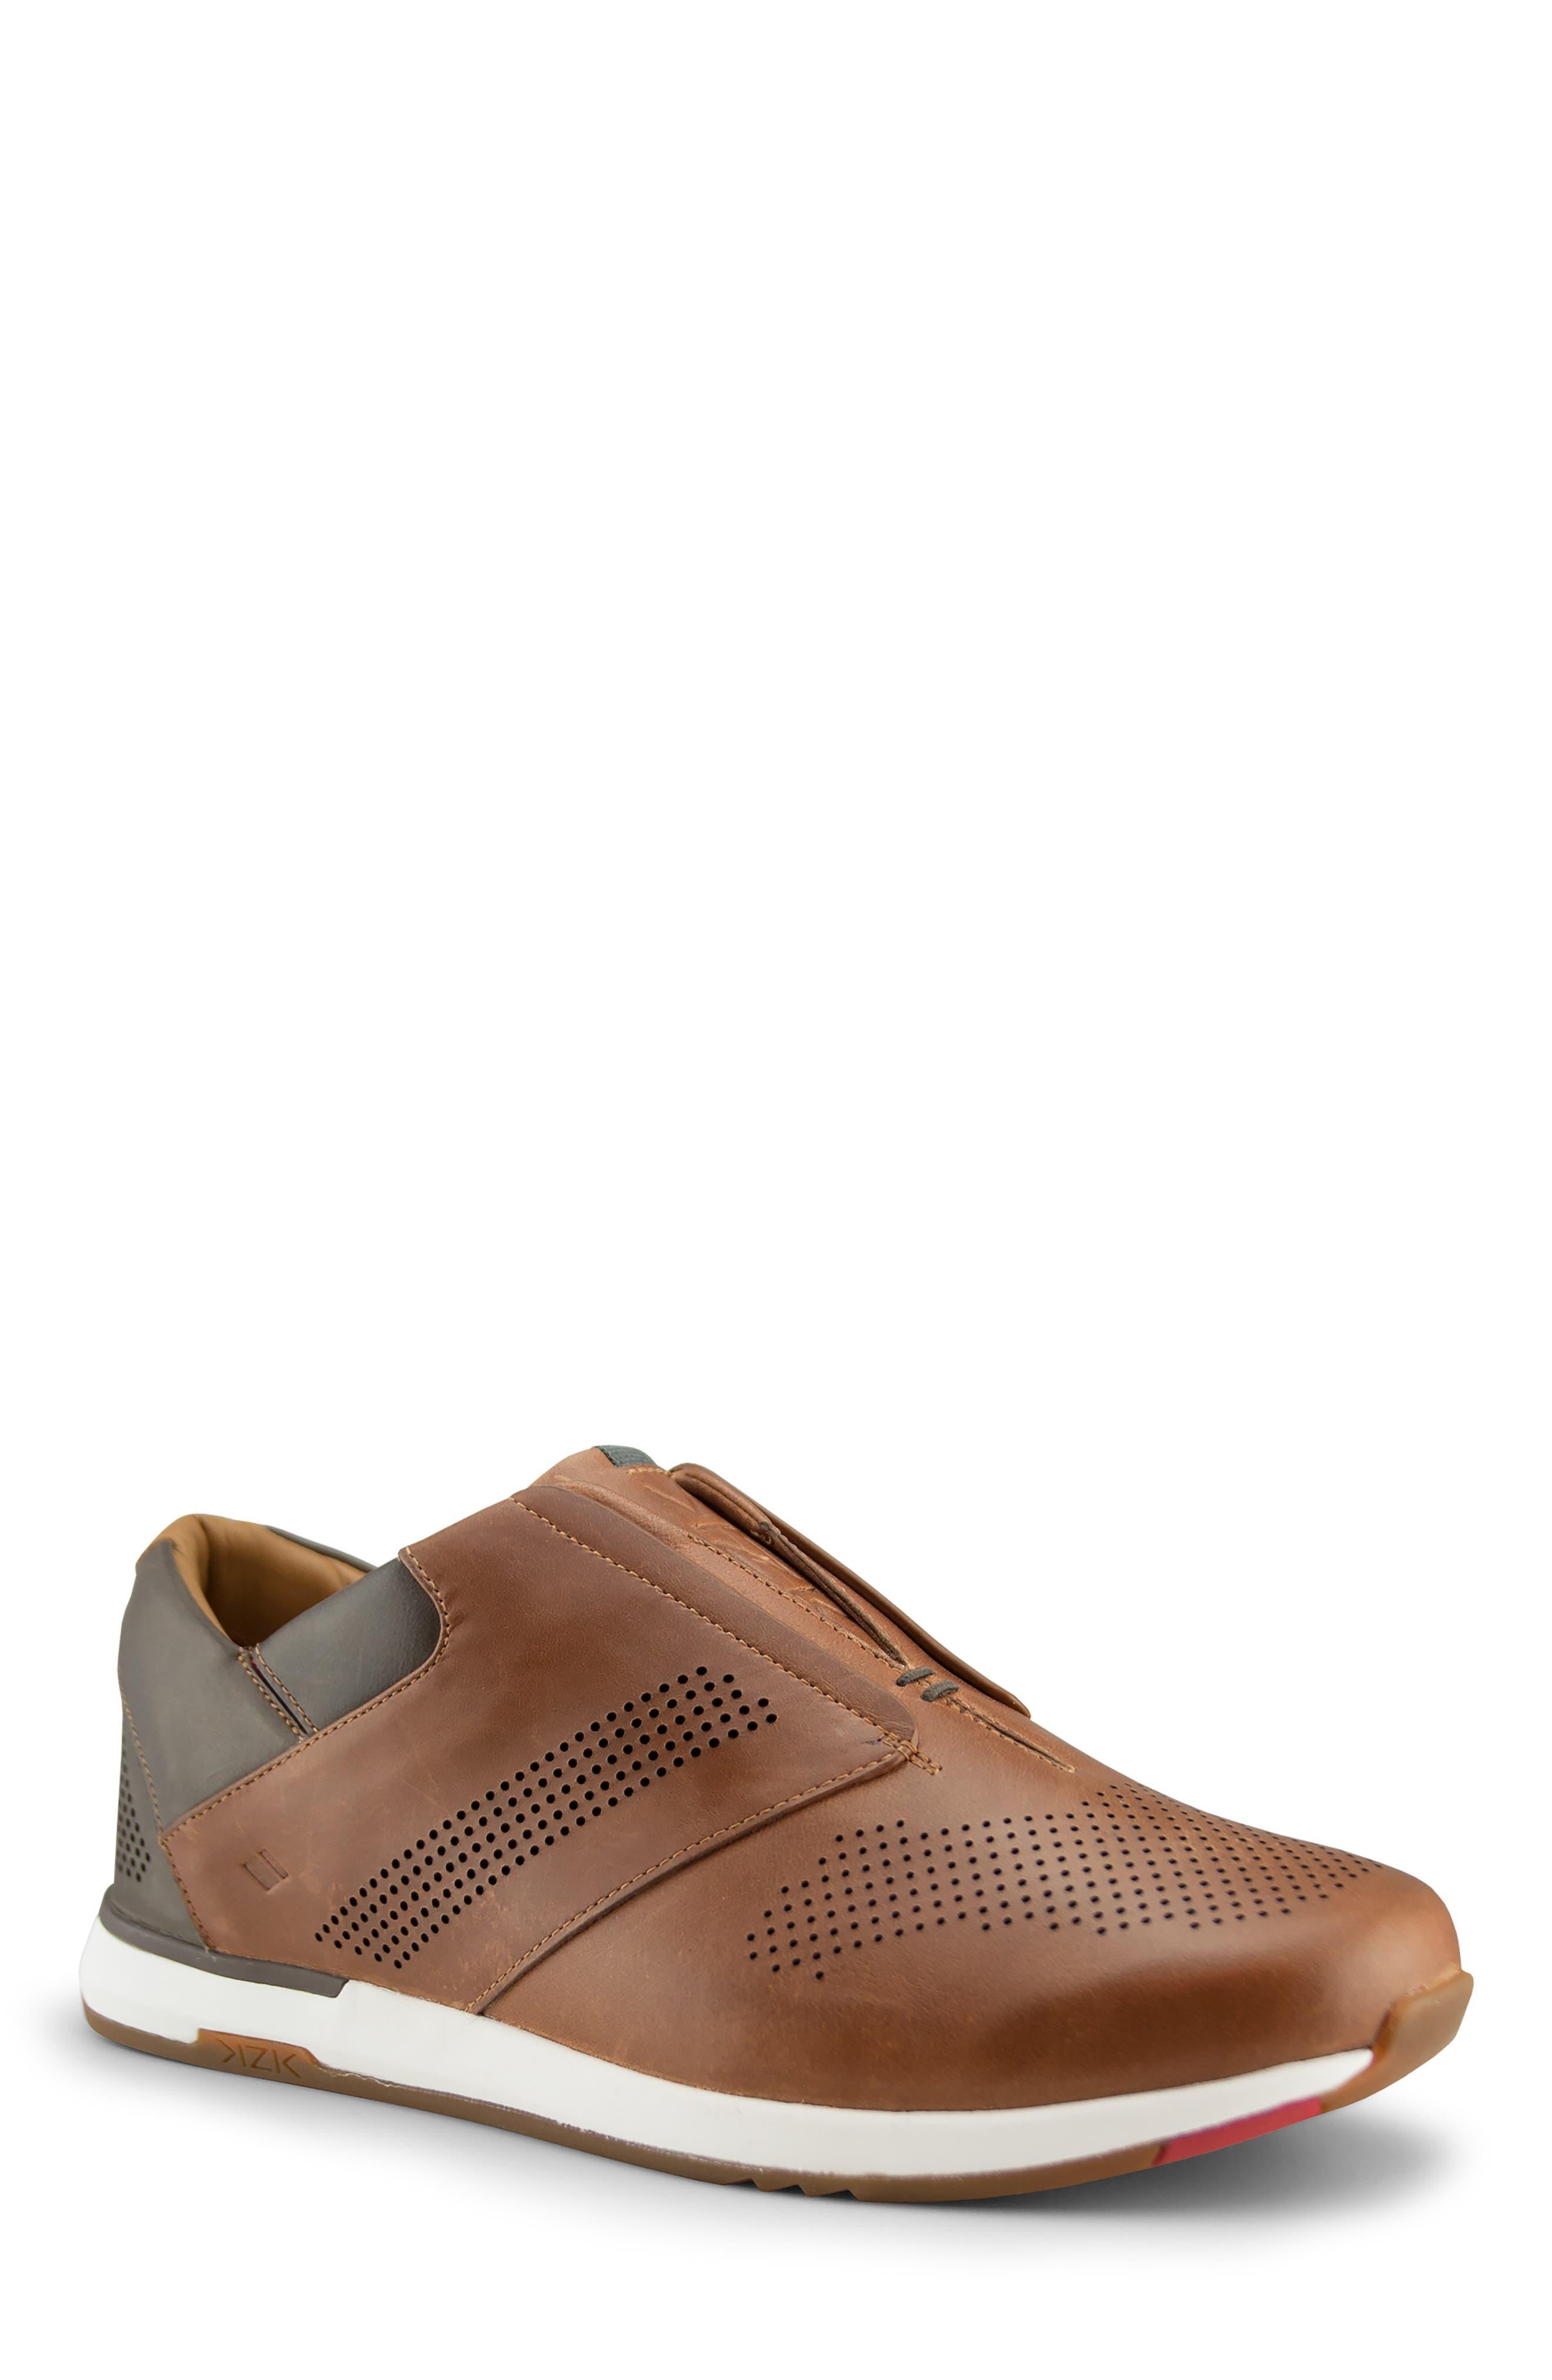 Kizik Dubai Slip-On Sneaker- Brown